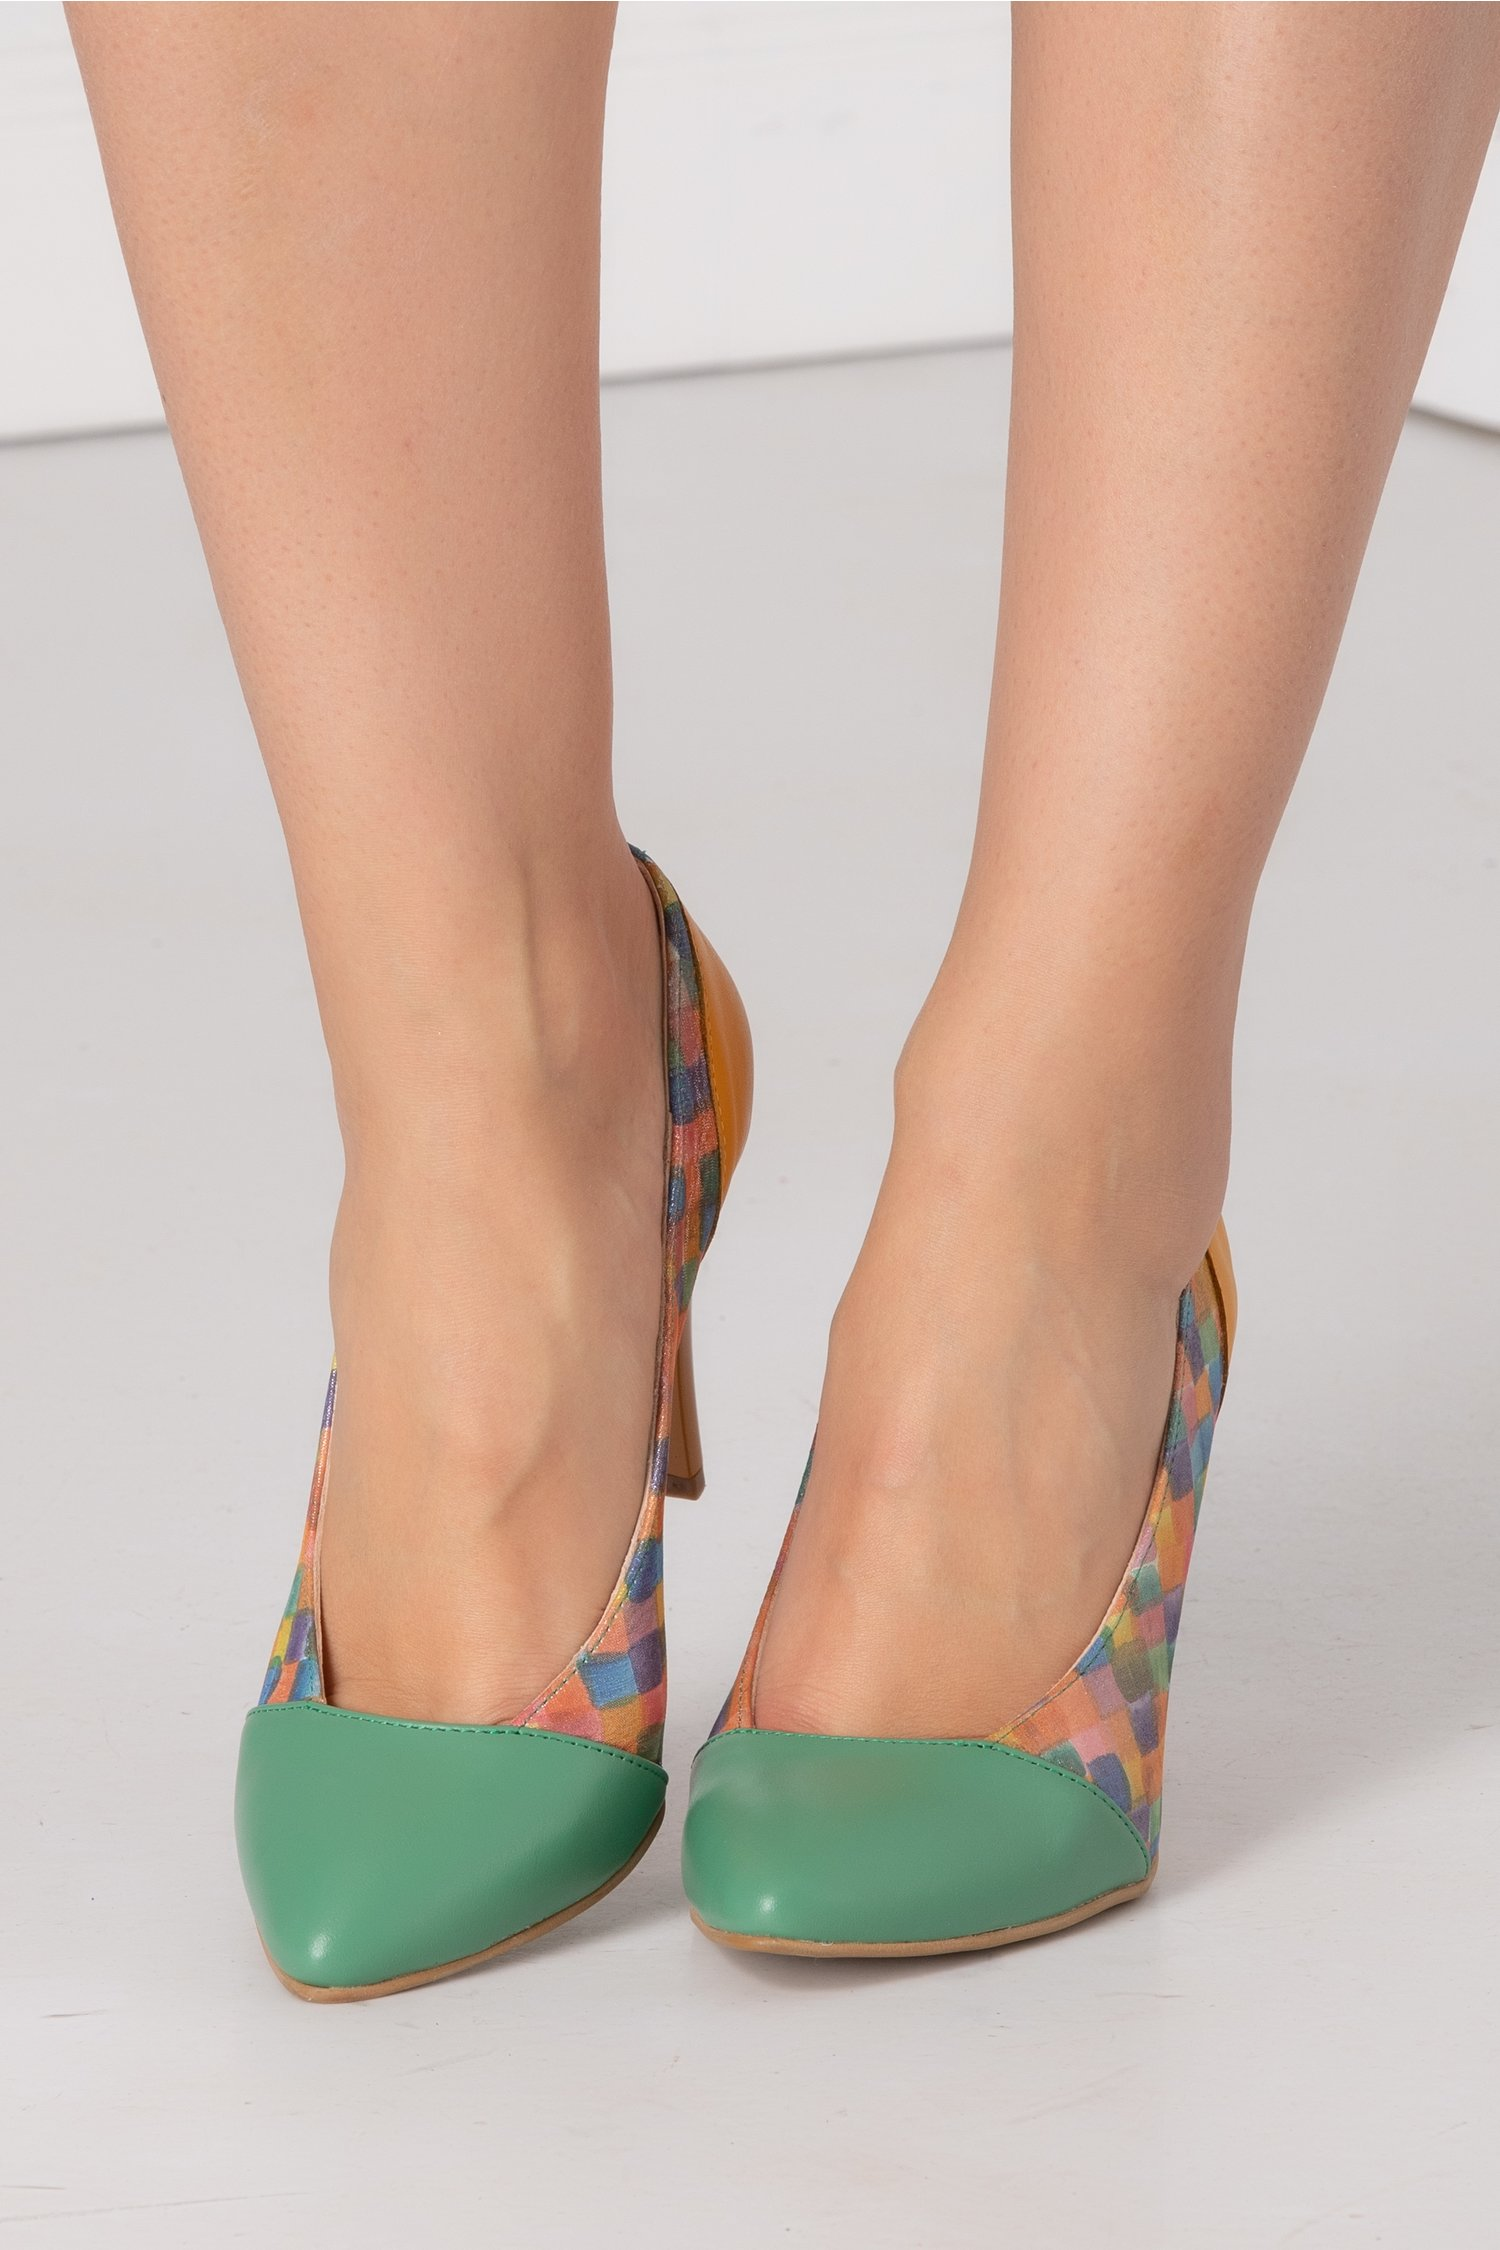 Pantofi stiletto verde si galben cu imprimeu pe laterale